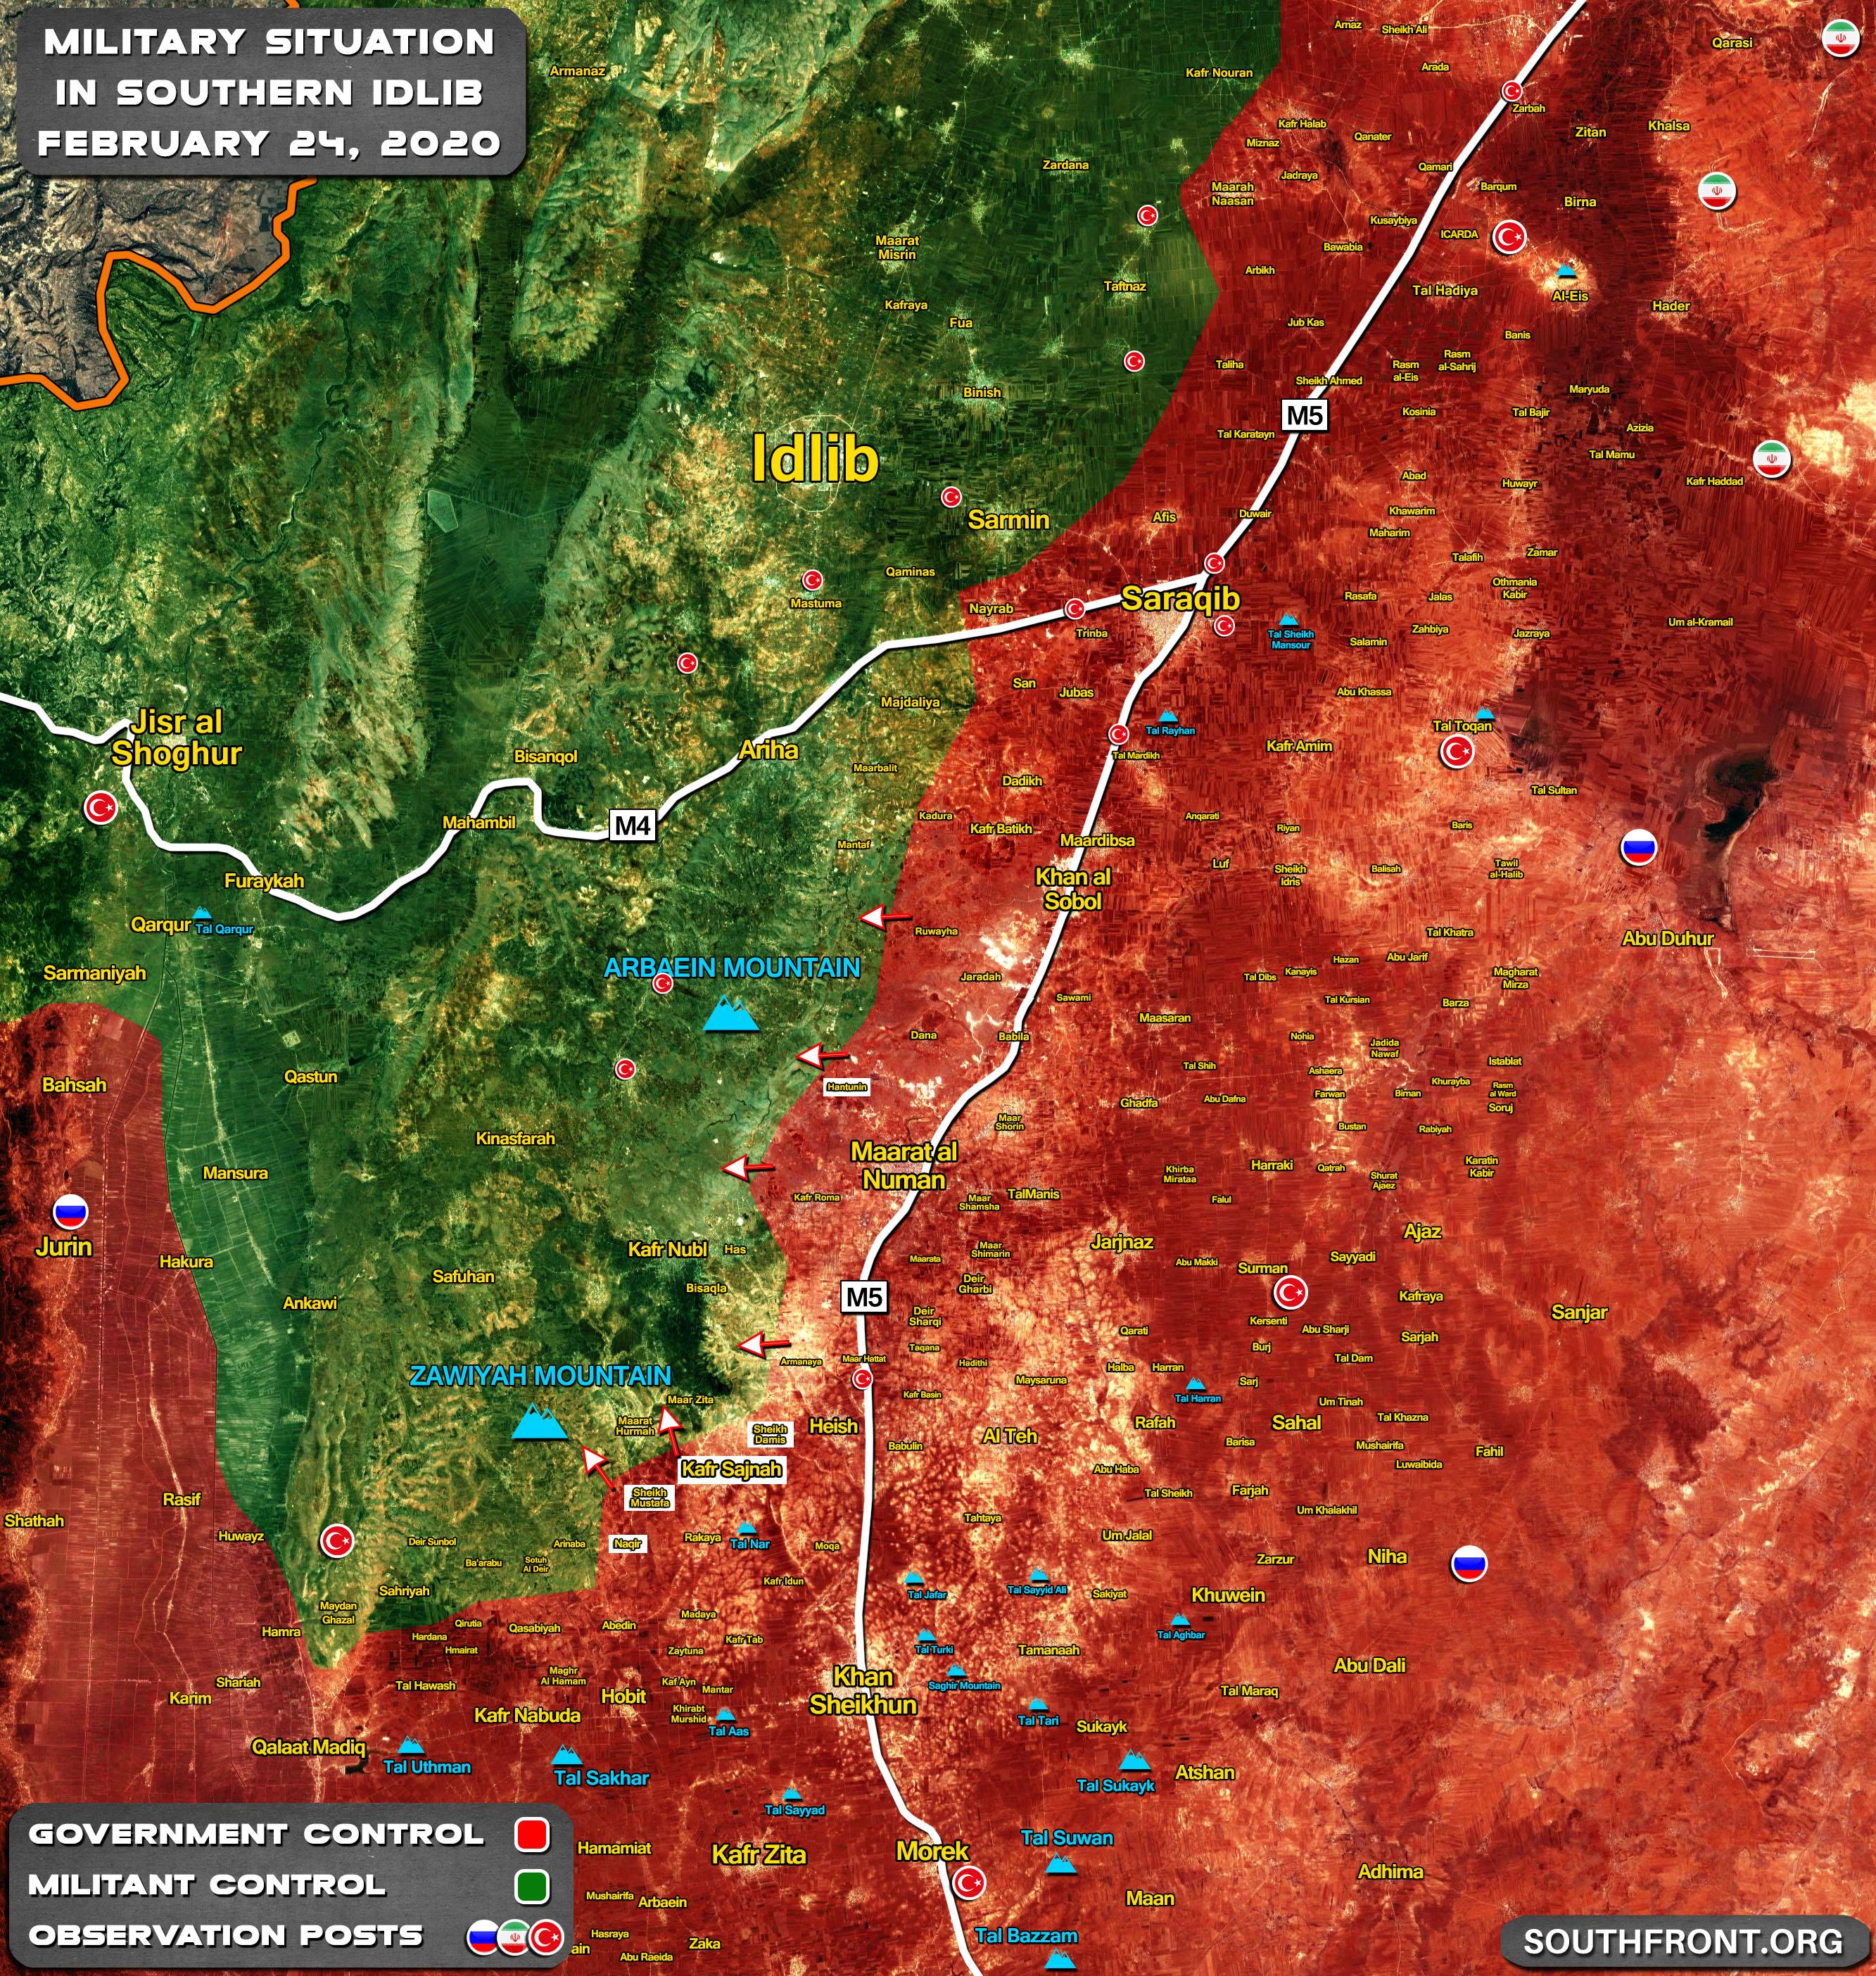 https://southfront.org/wp-content/uploads/2020/02/24feb_Southern-Idlib.jpg